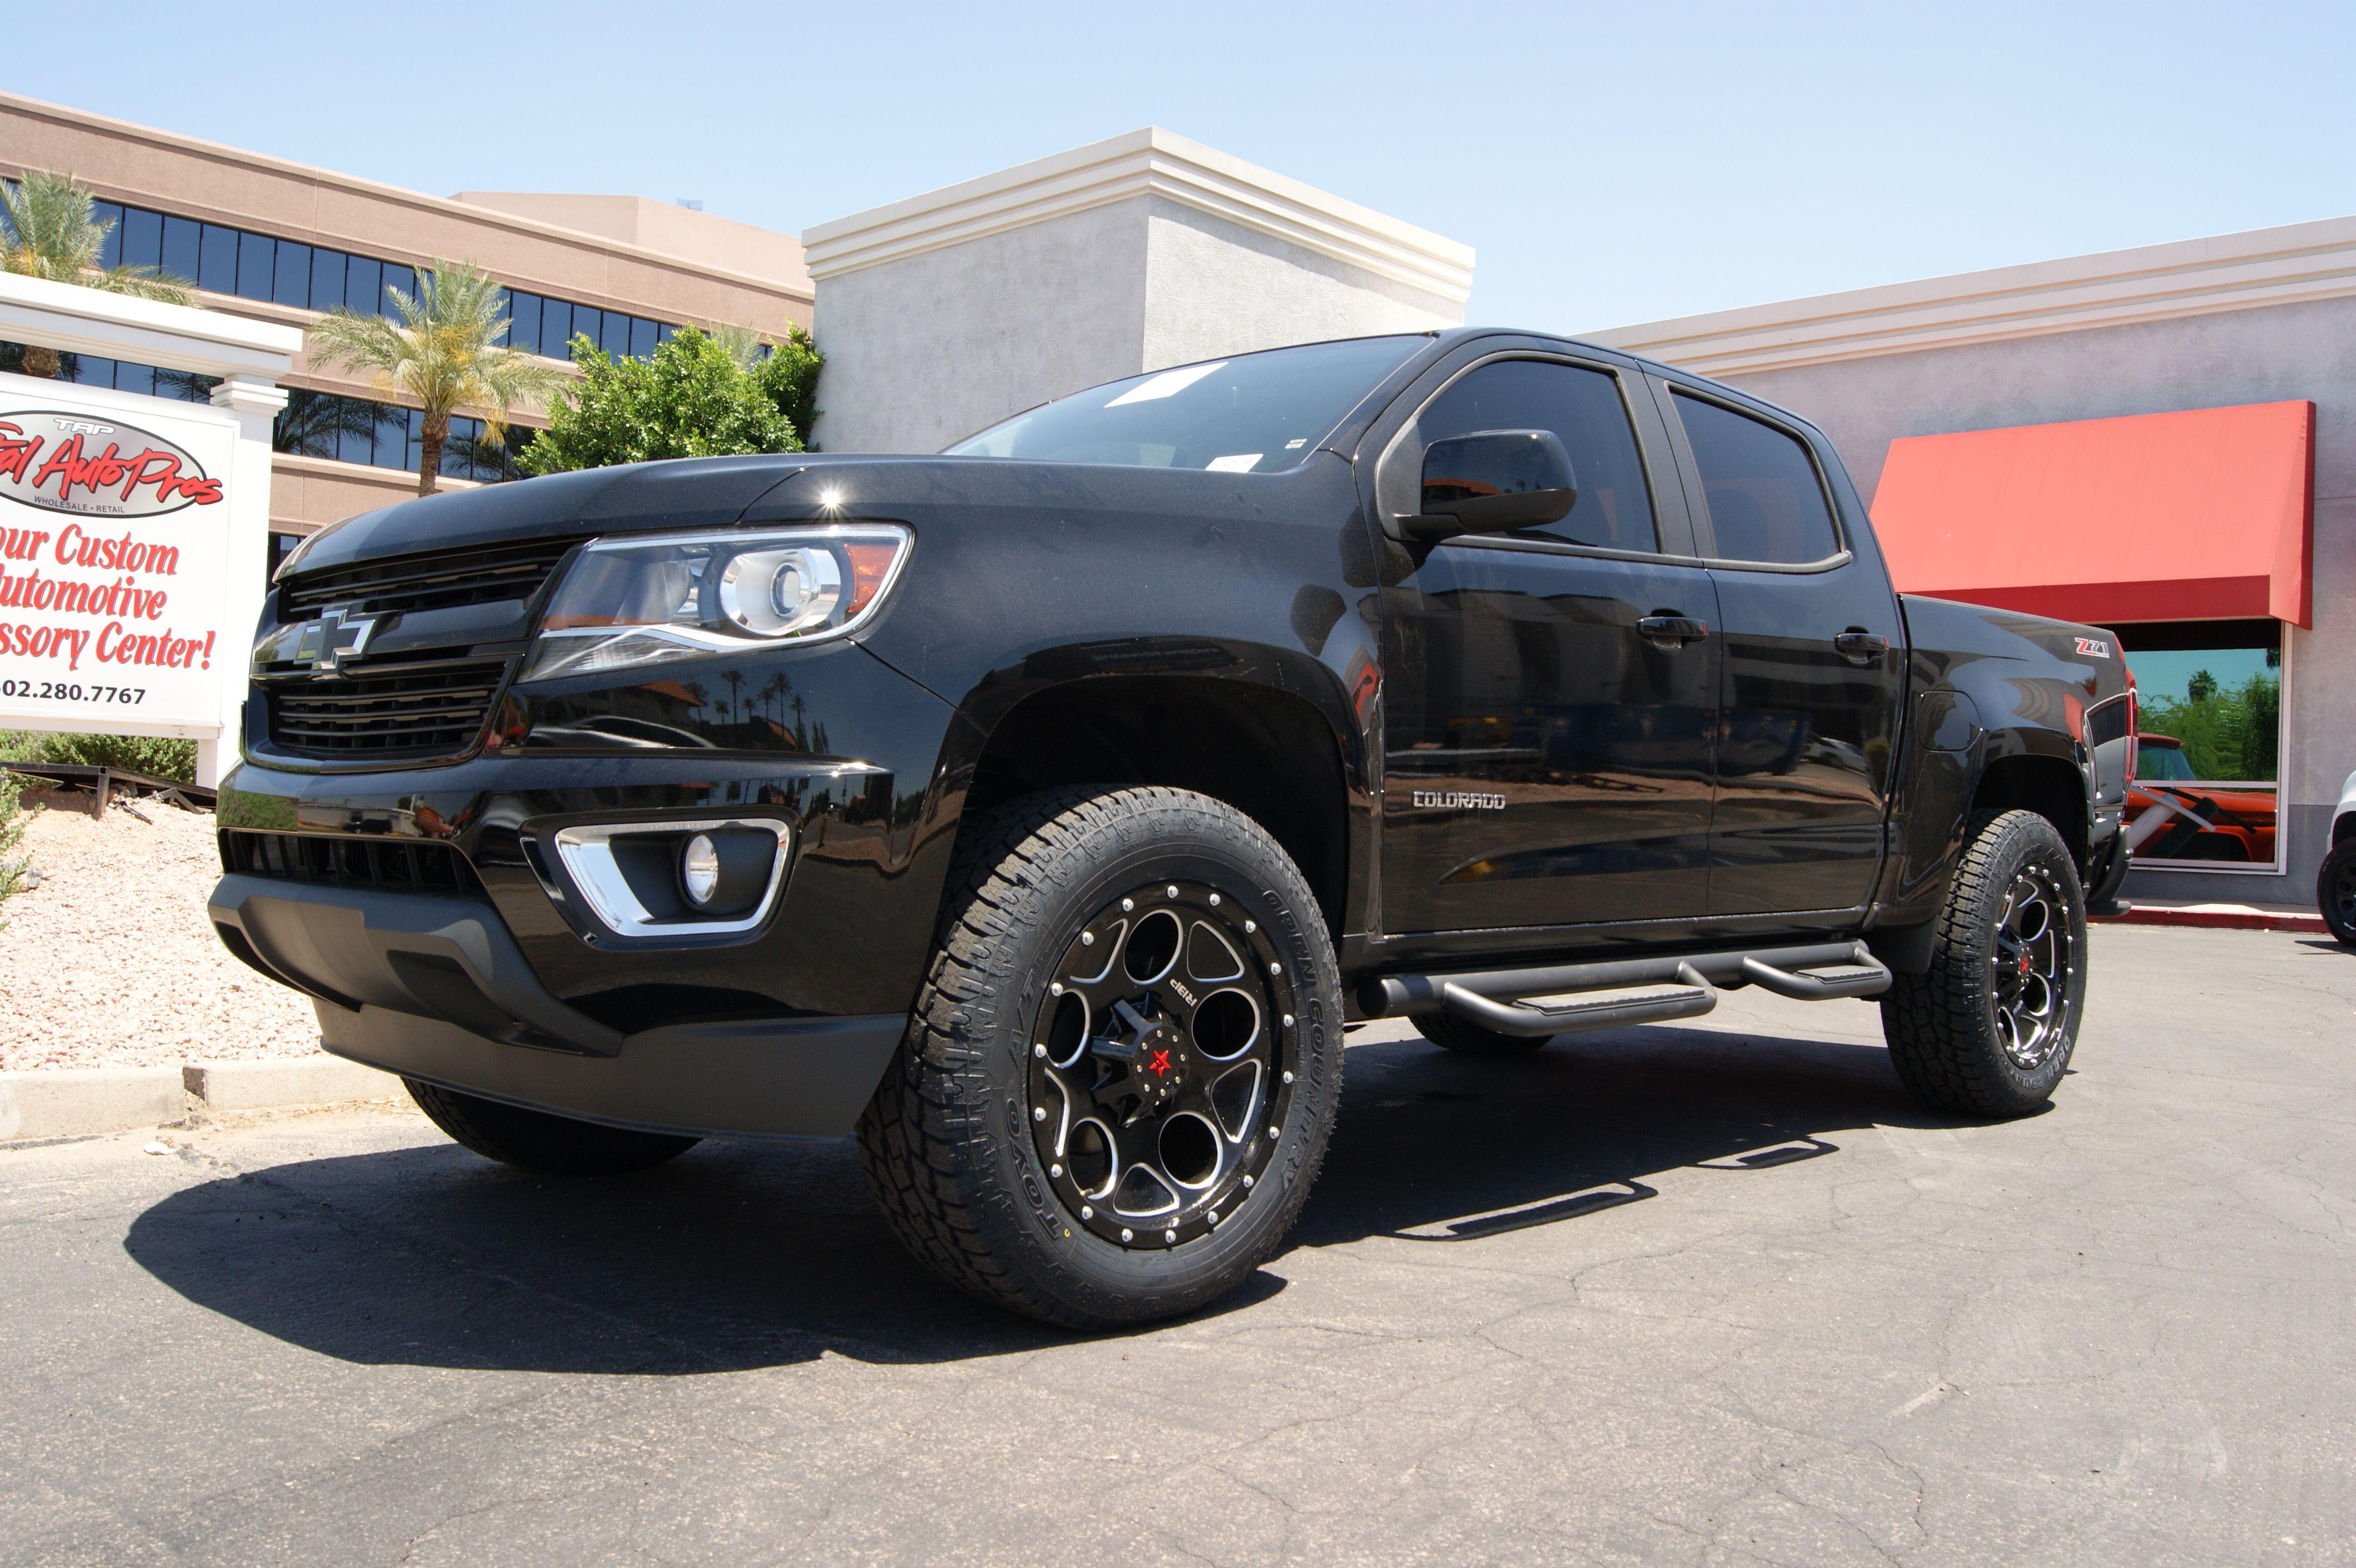 2015 Chevrolet Colorado Lt275 60r20 Toyo Open Country A T Ii